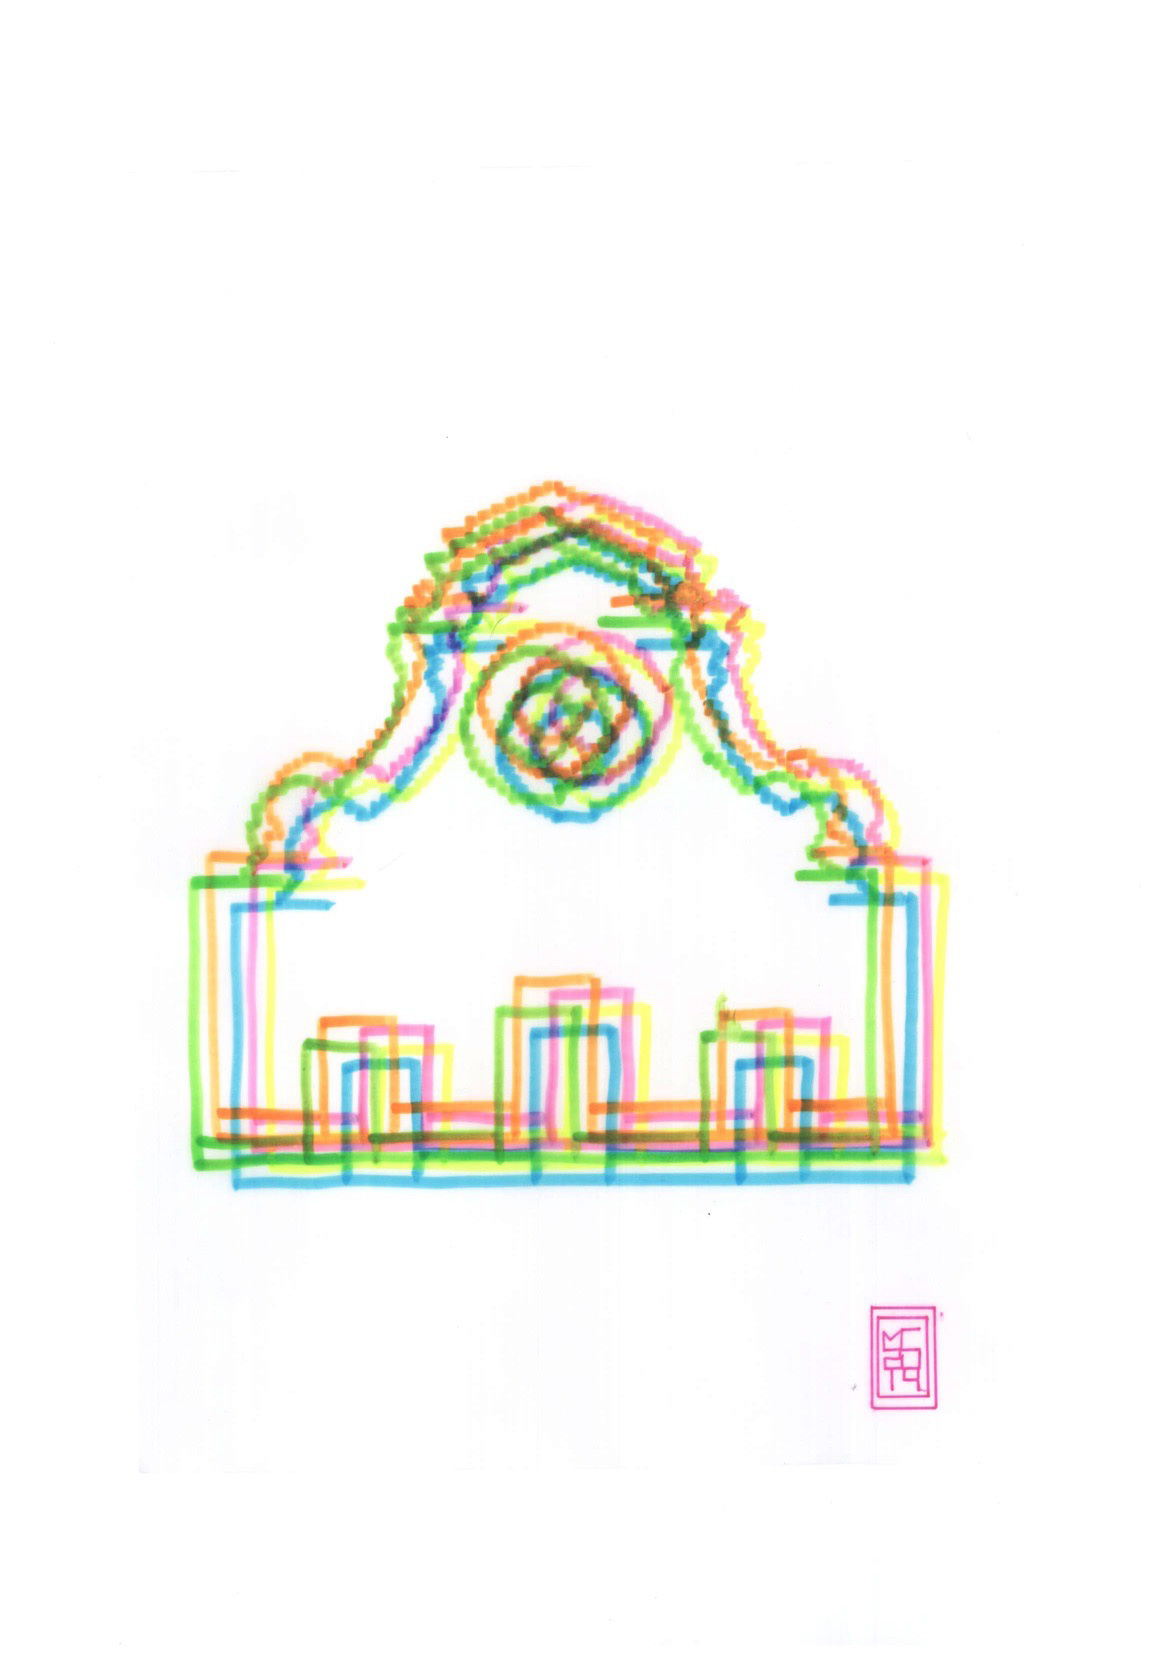 Michele Chiossi Santa Maria Novella, 2014, pennarelli su carta da lucido, A4 disegno zigzag Firenze